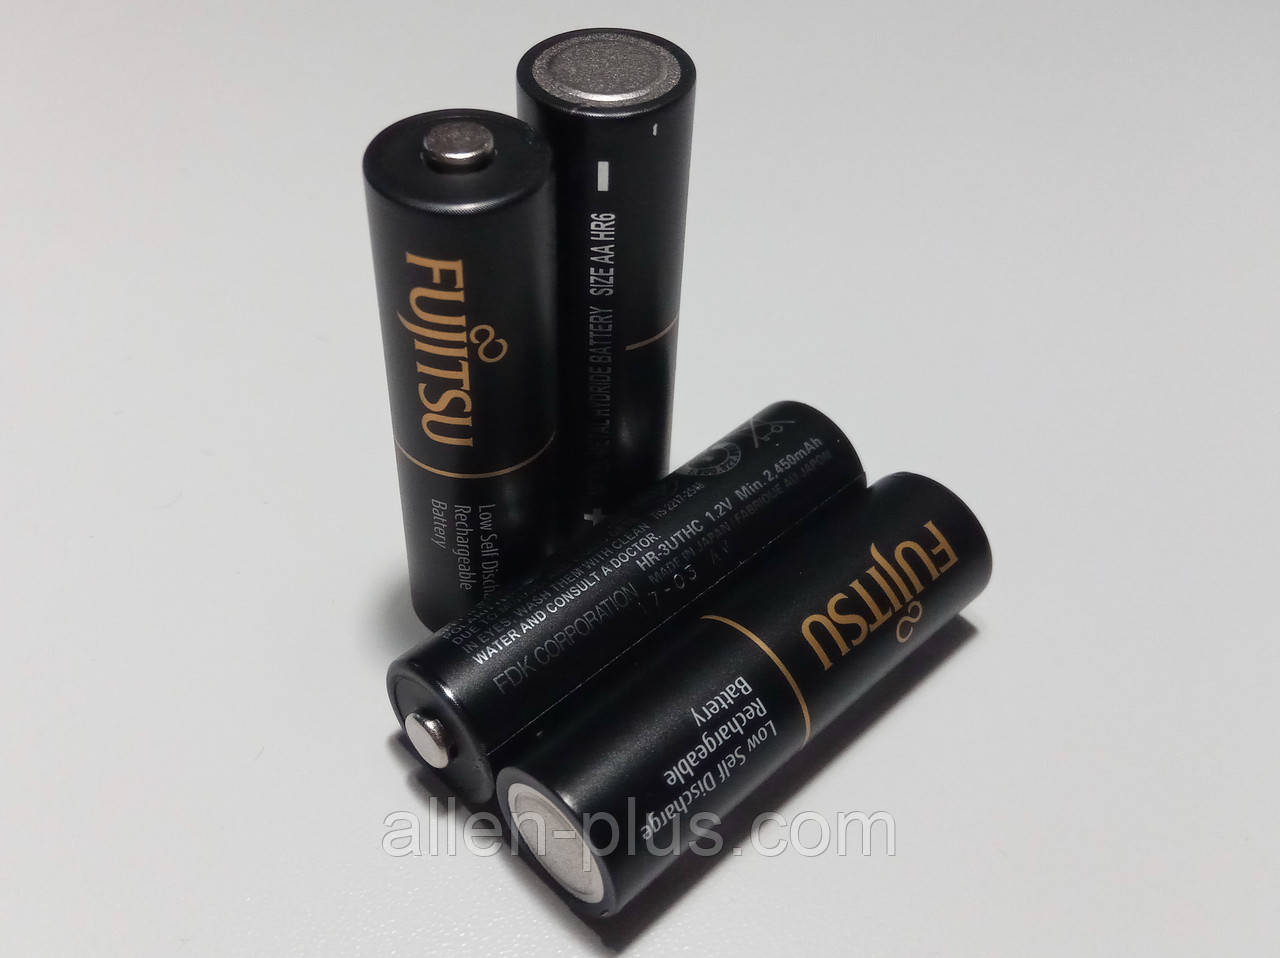 Аккумулятор Fujitsu Pro AA 1,2V (min 2450 mAh), HR-3UTHC, аналог eneloop pro